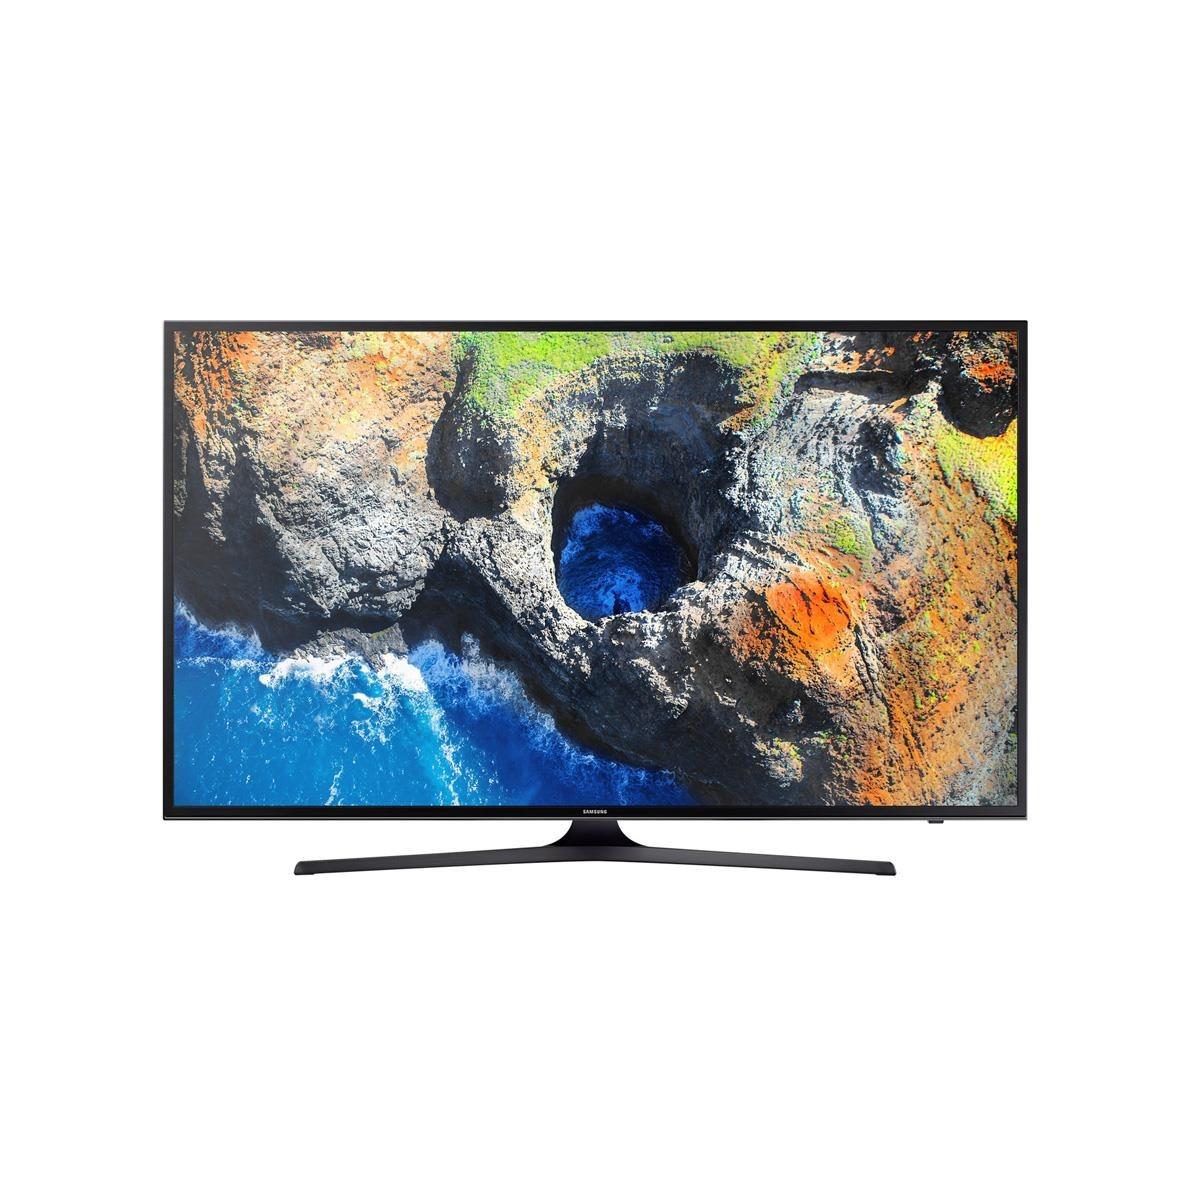 SMART TV LED 40' Samsung 4K, RGB, UHD,HDR Premium,Quad Core, UHD Diming, c/ Conversor Digital, 3 HDMI 2 USB, Wifi Integrado, 20W, 120hz-UN40MU6100GXZD